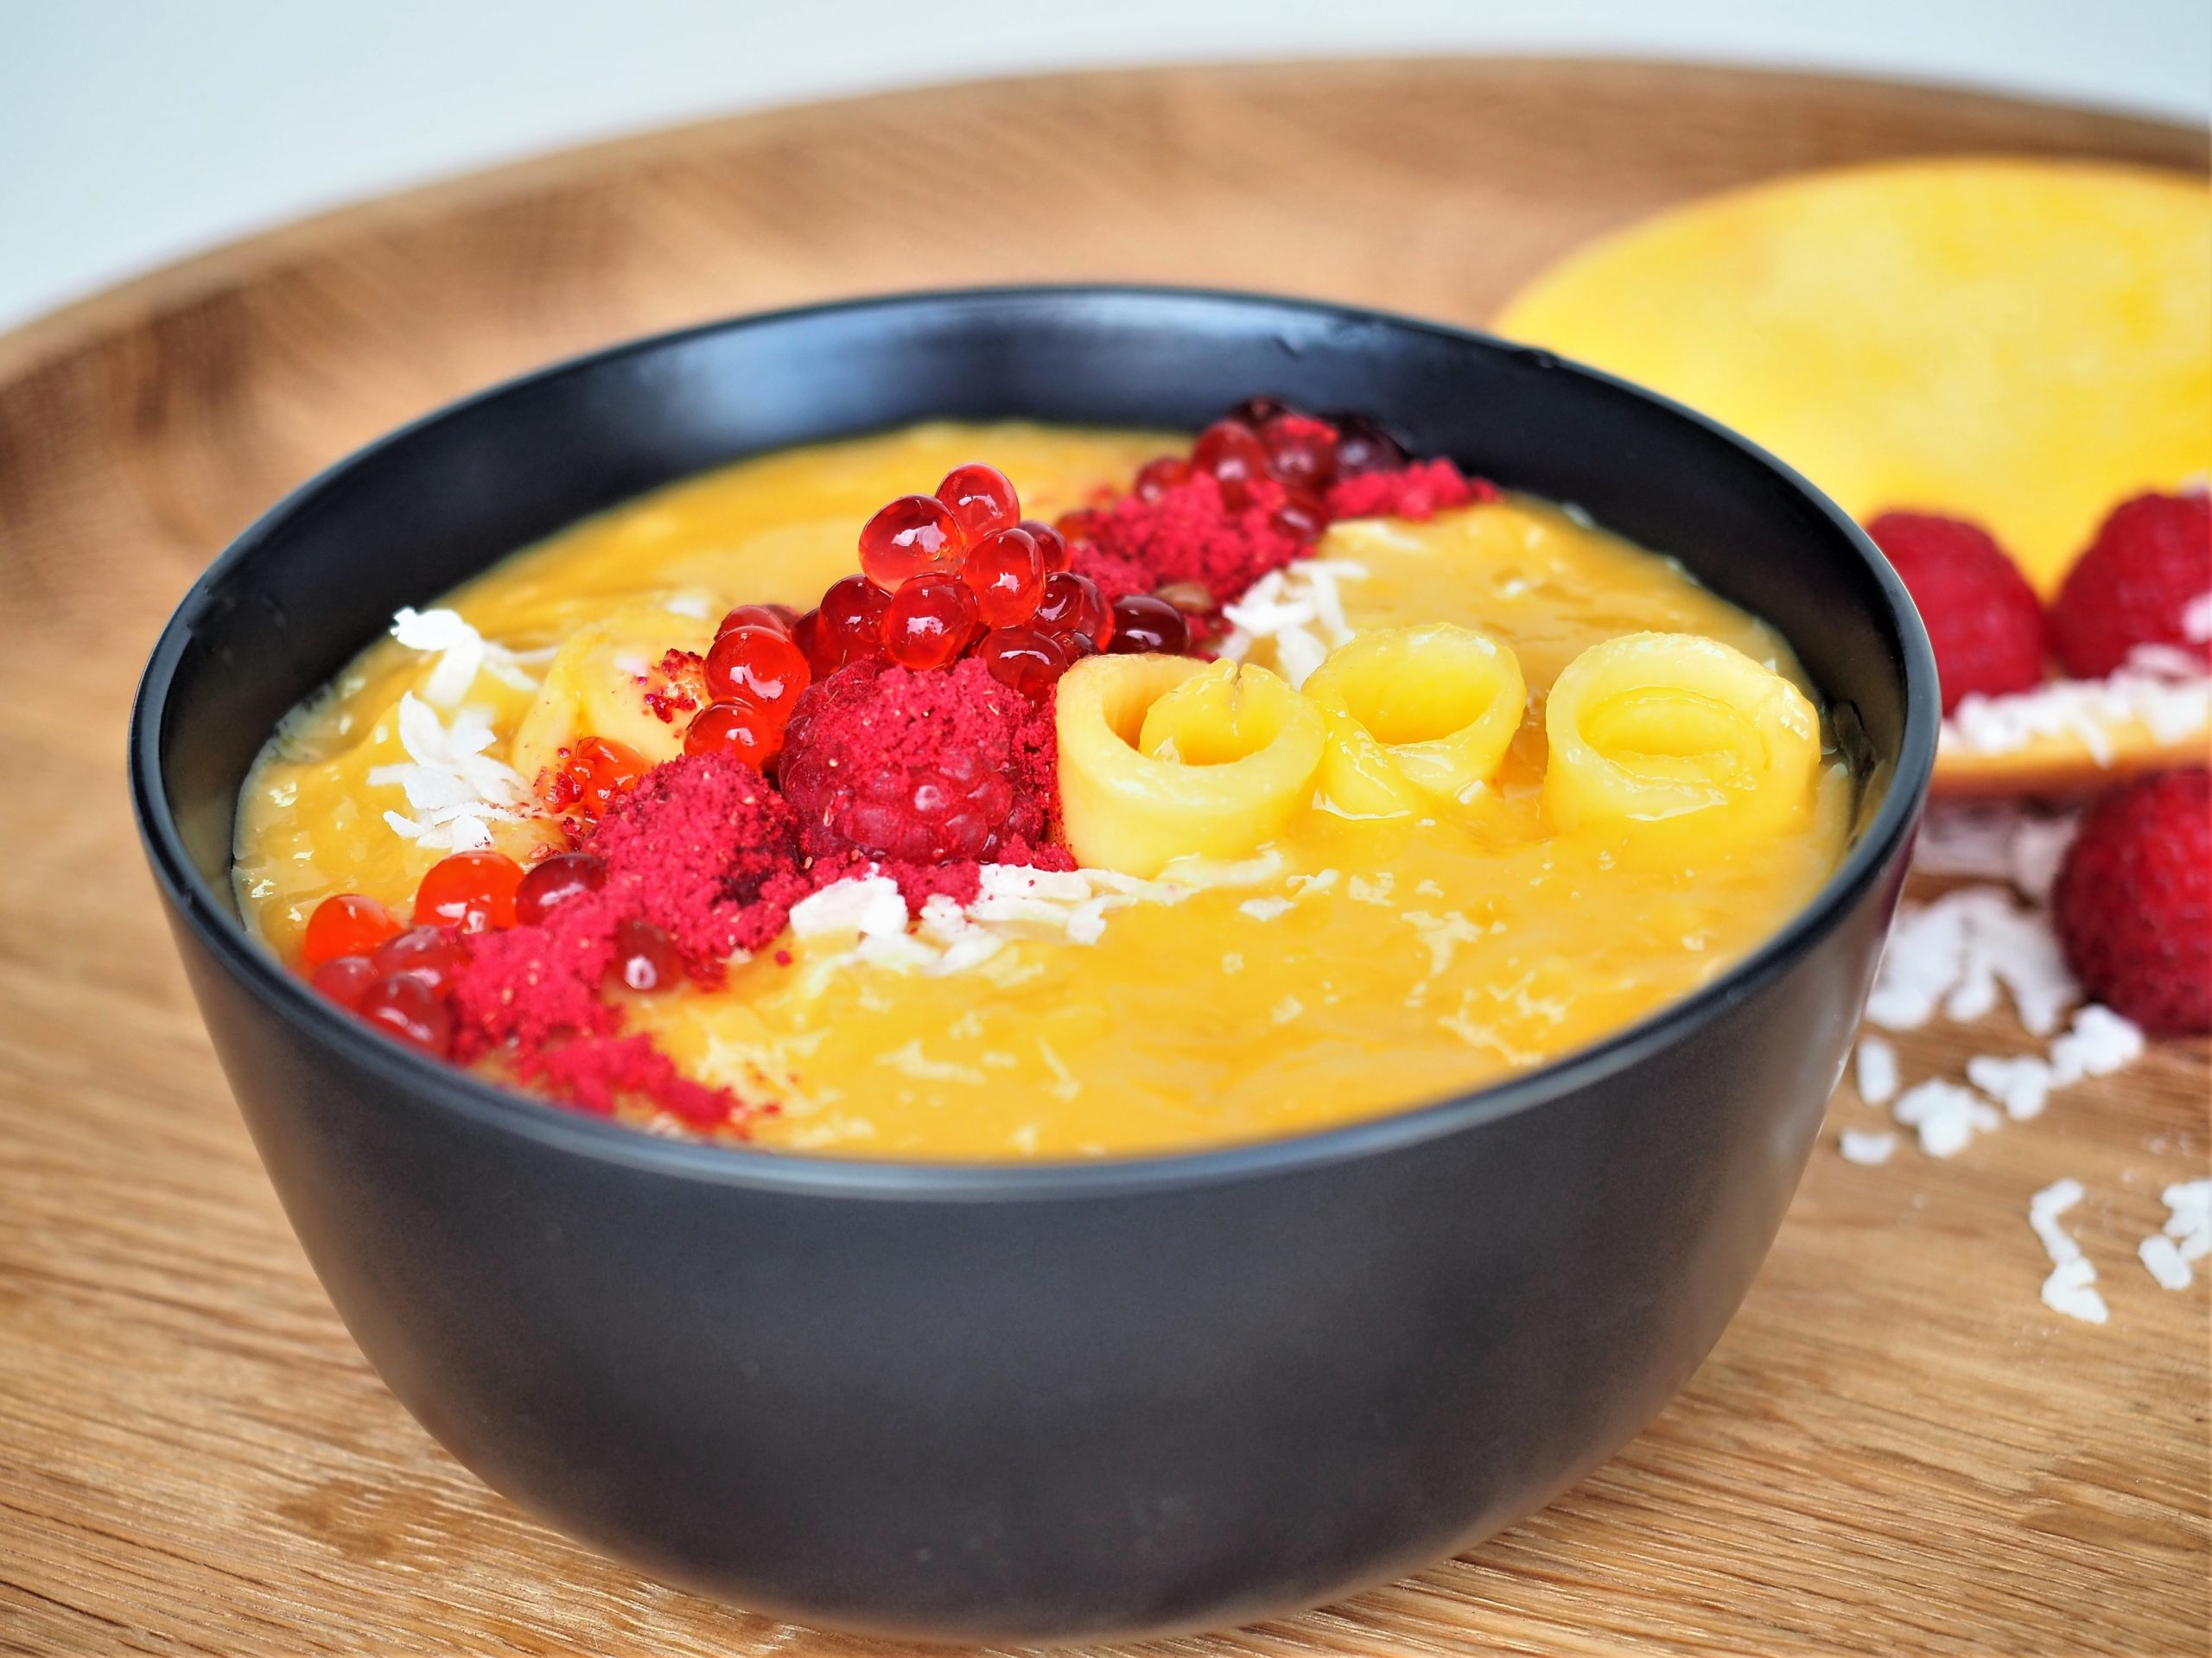 Mango and Raspberry Smoothie Bowl